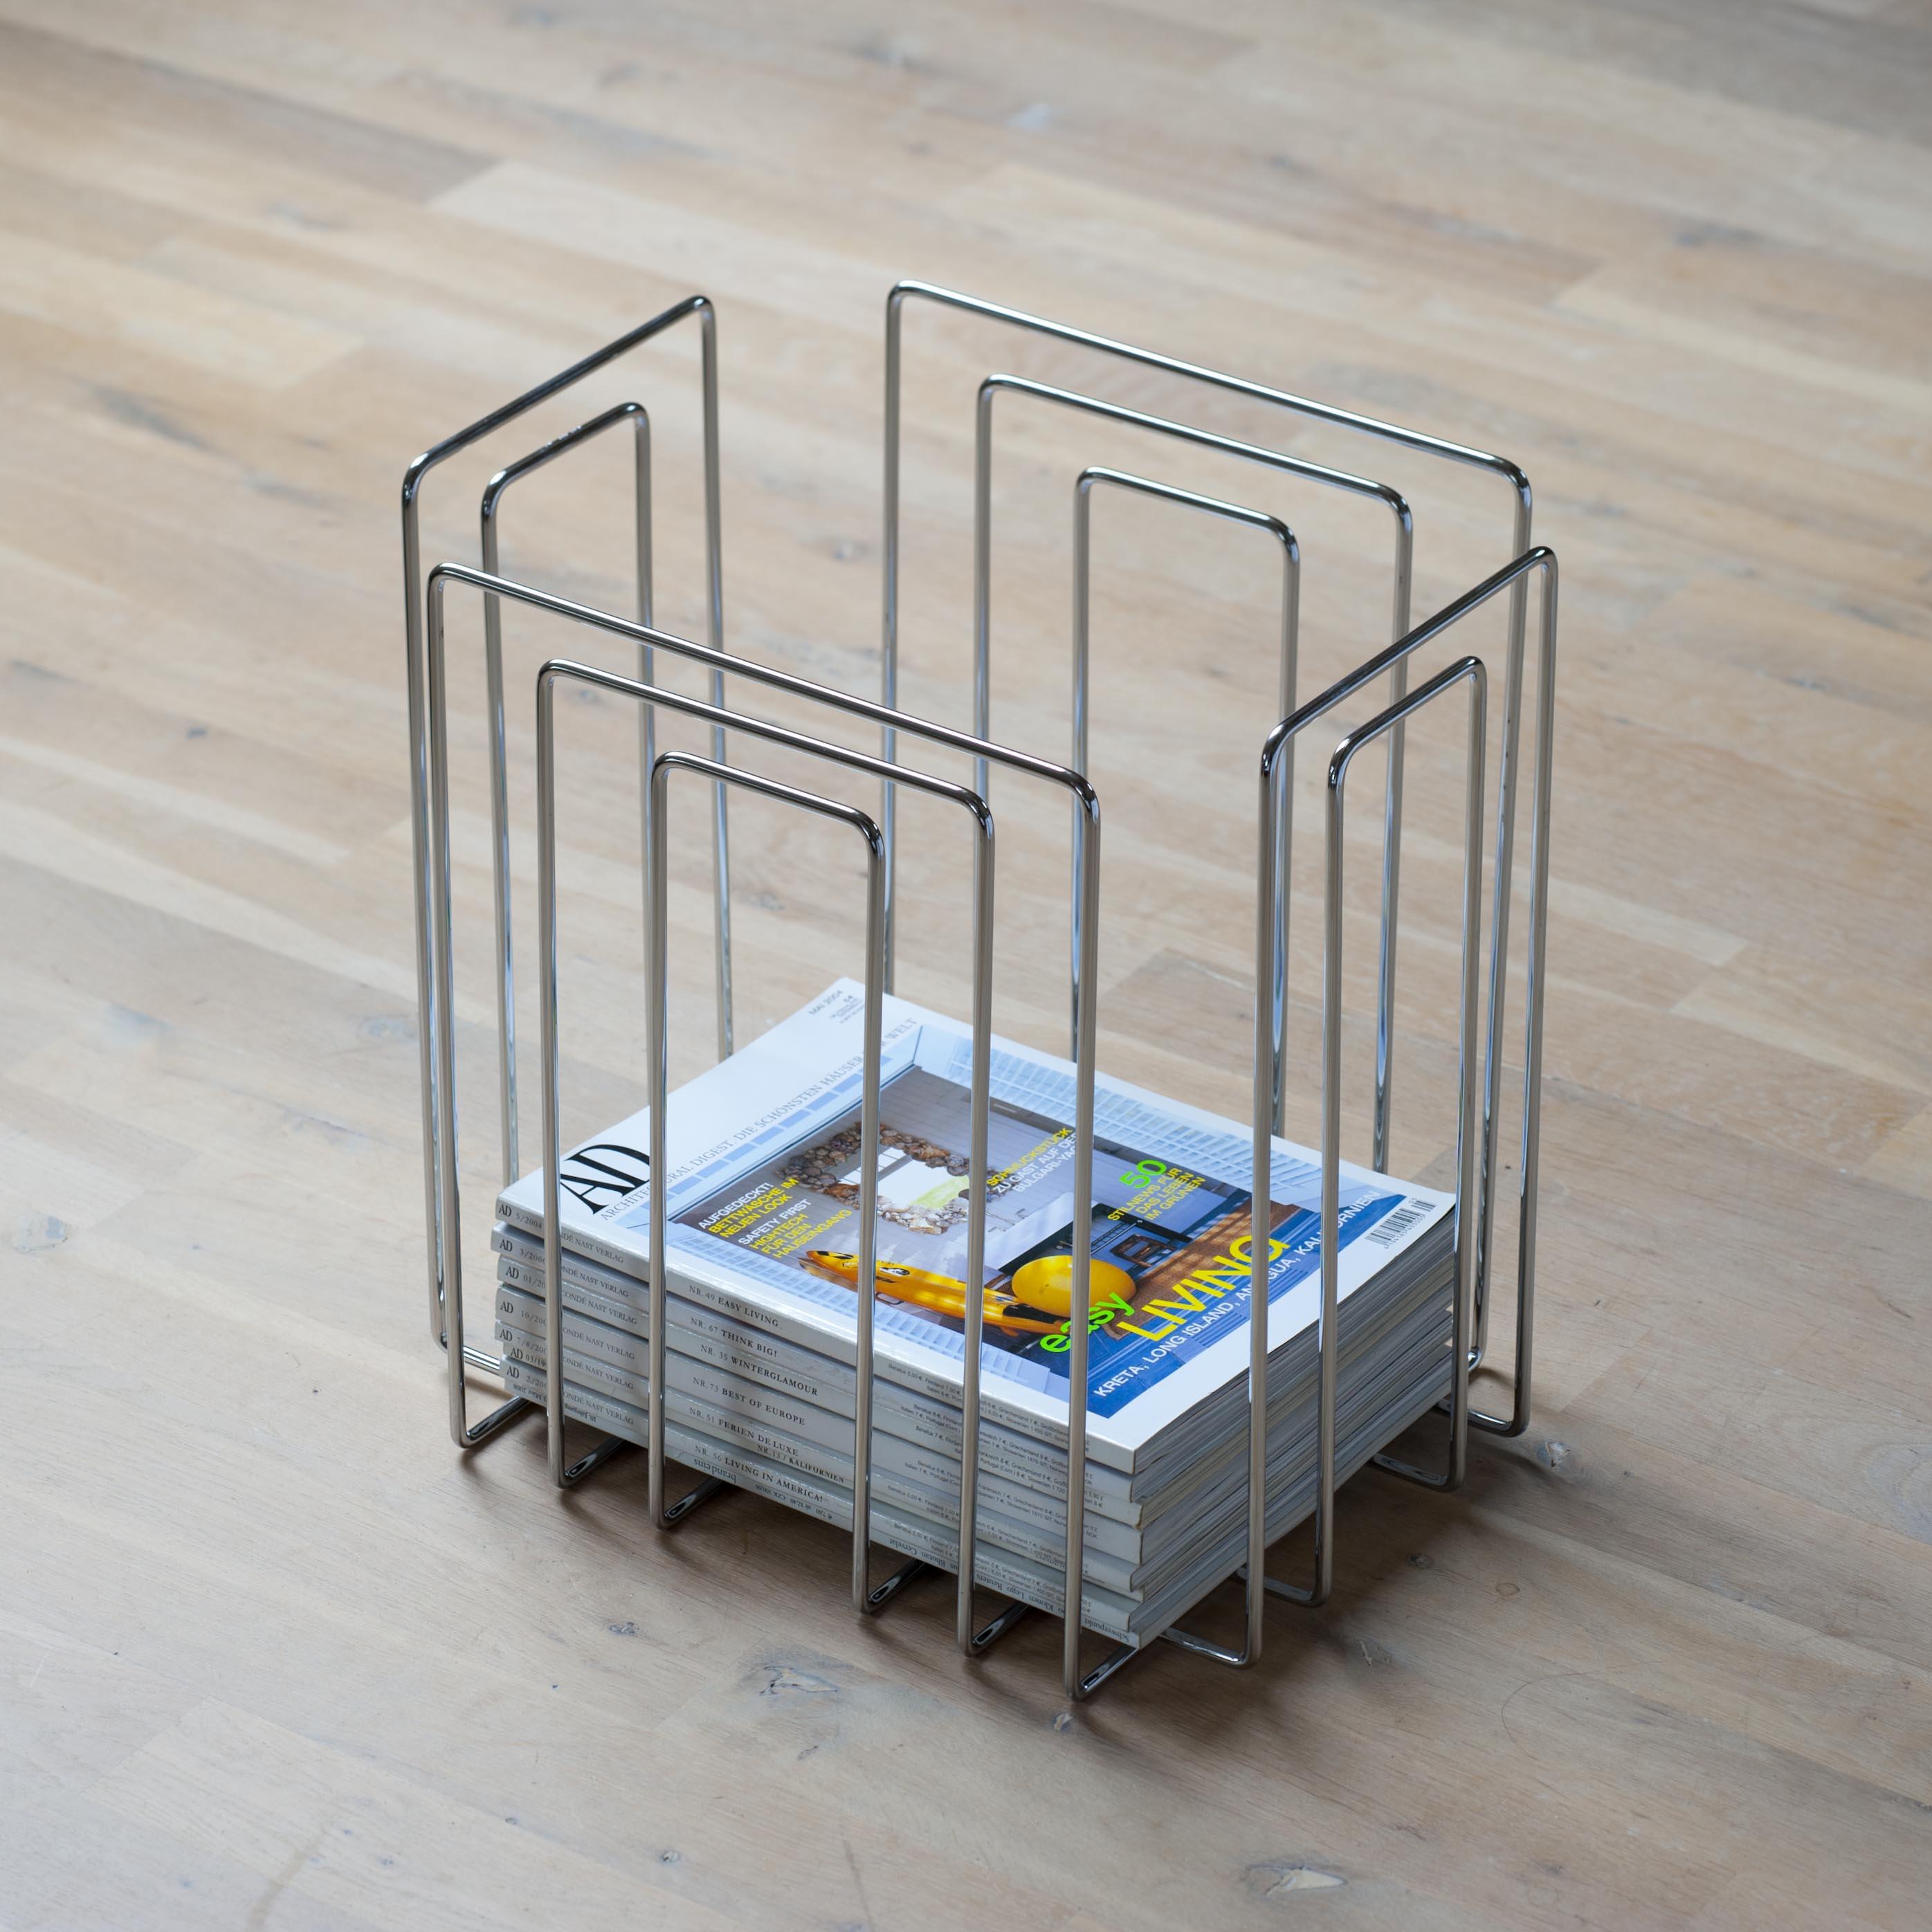 zeitschriften sammler paper collector bei. Black Bedroom Furniture Sets. Home Design Ideas